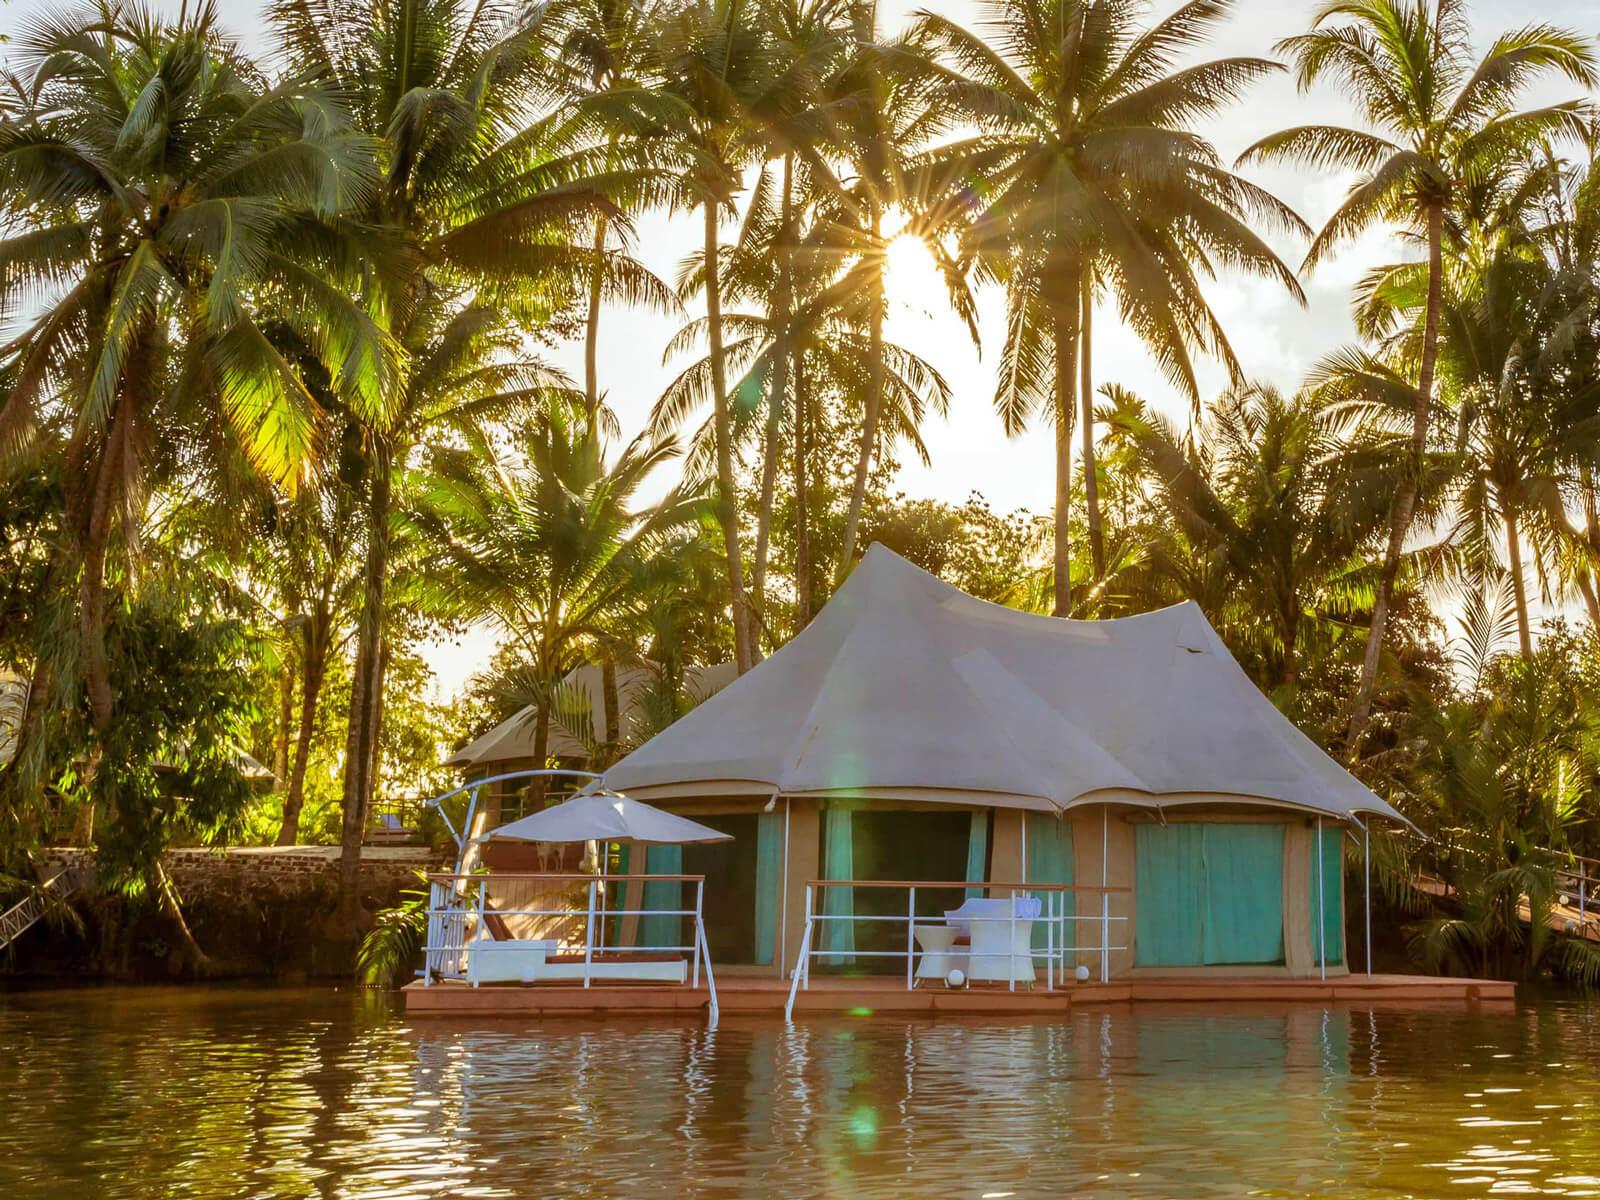 rondreis cambodja koh kong 4 rivers floating lodge hotel blog 10